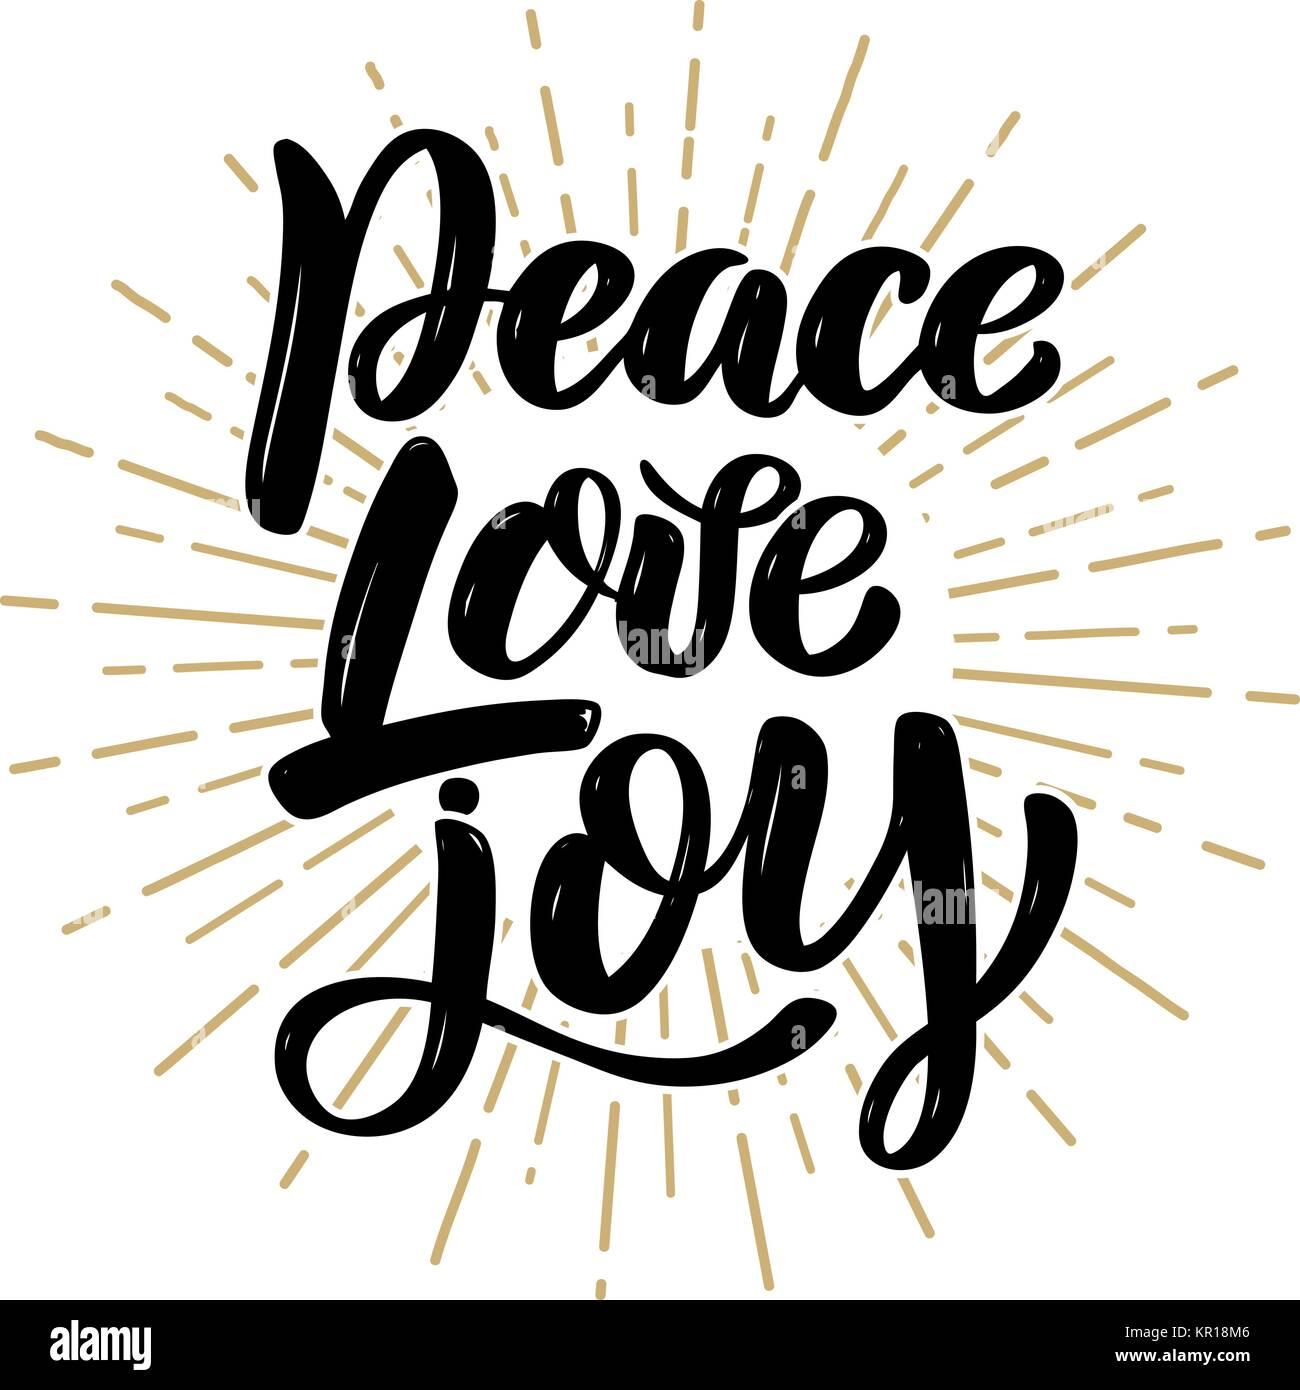 Peace Love Joy Quotes Invitatio Stock Photos & Invitatio Stock Images  Alamy